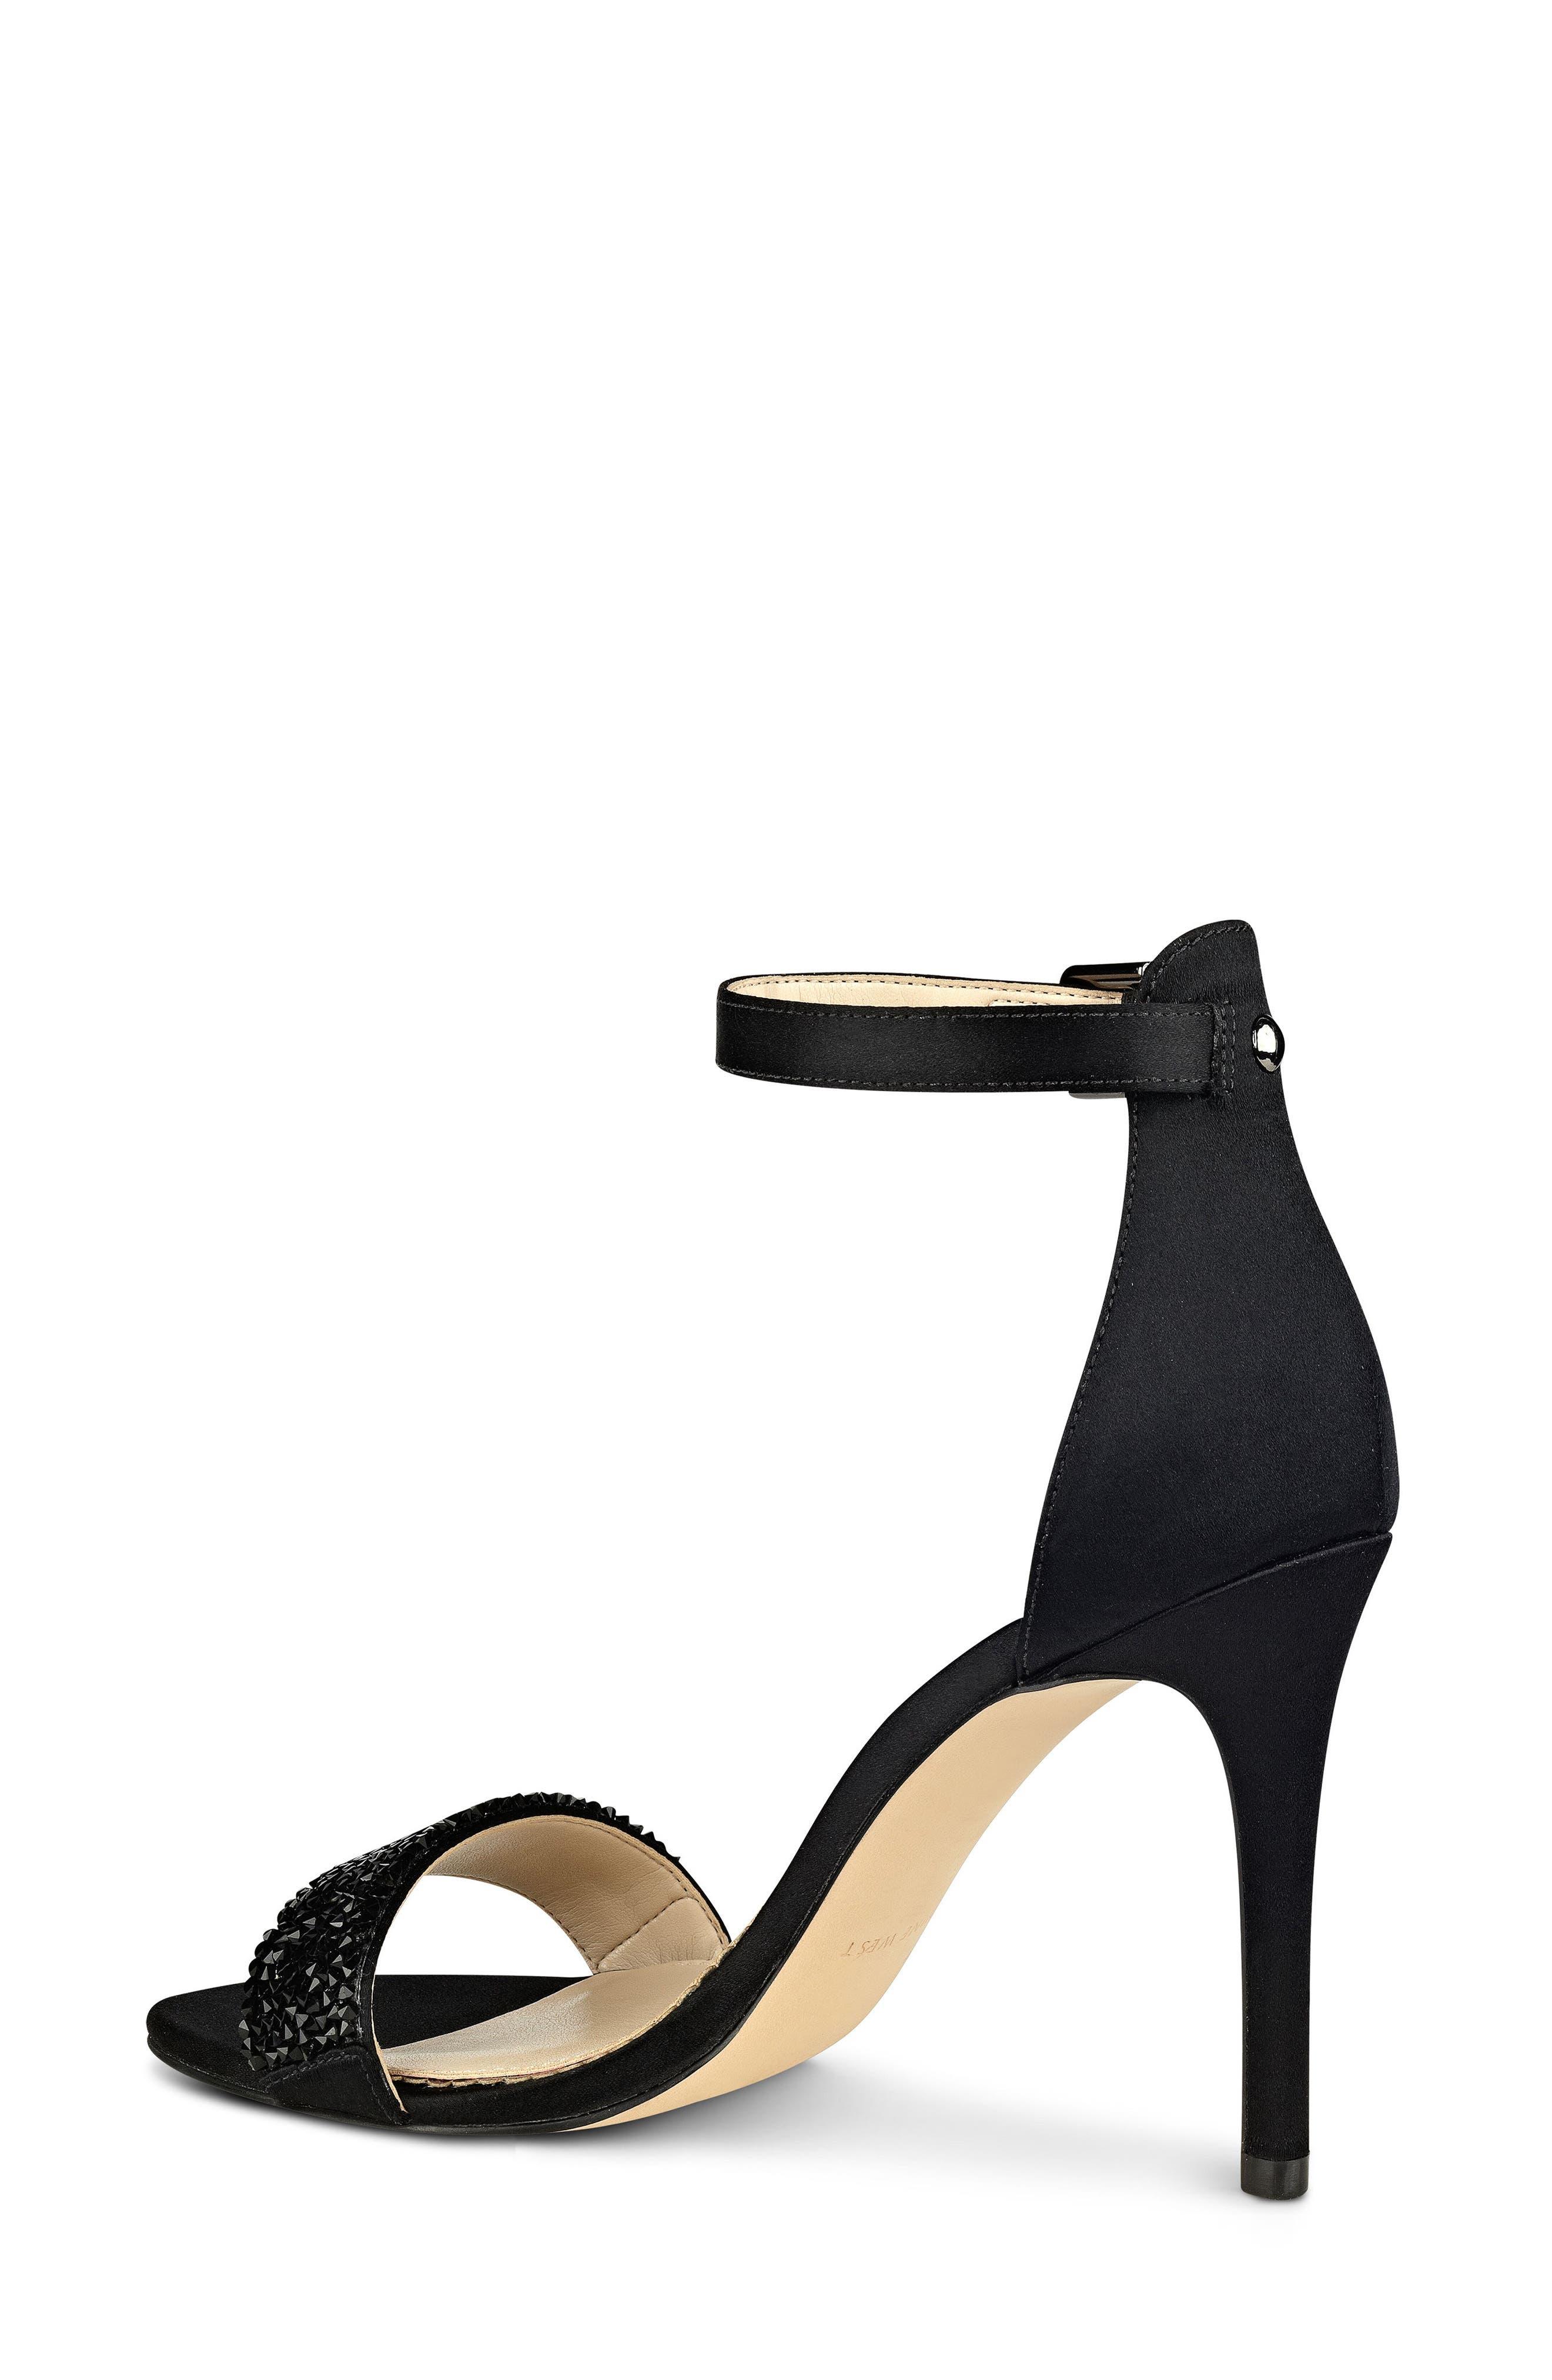 'Mana' Ankle Strap Sandal,                             Alternate thumbnail 2, color,                             Black Satin